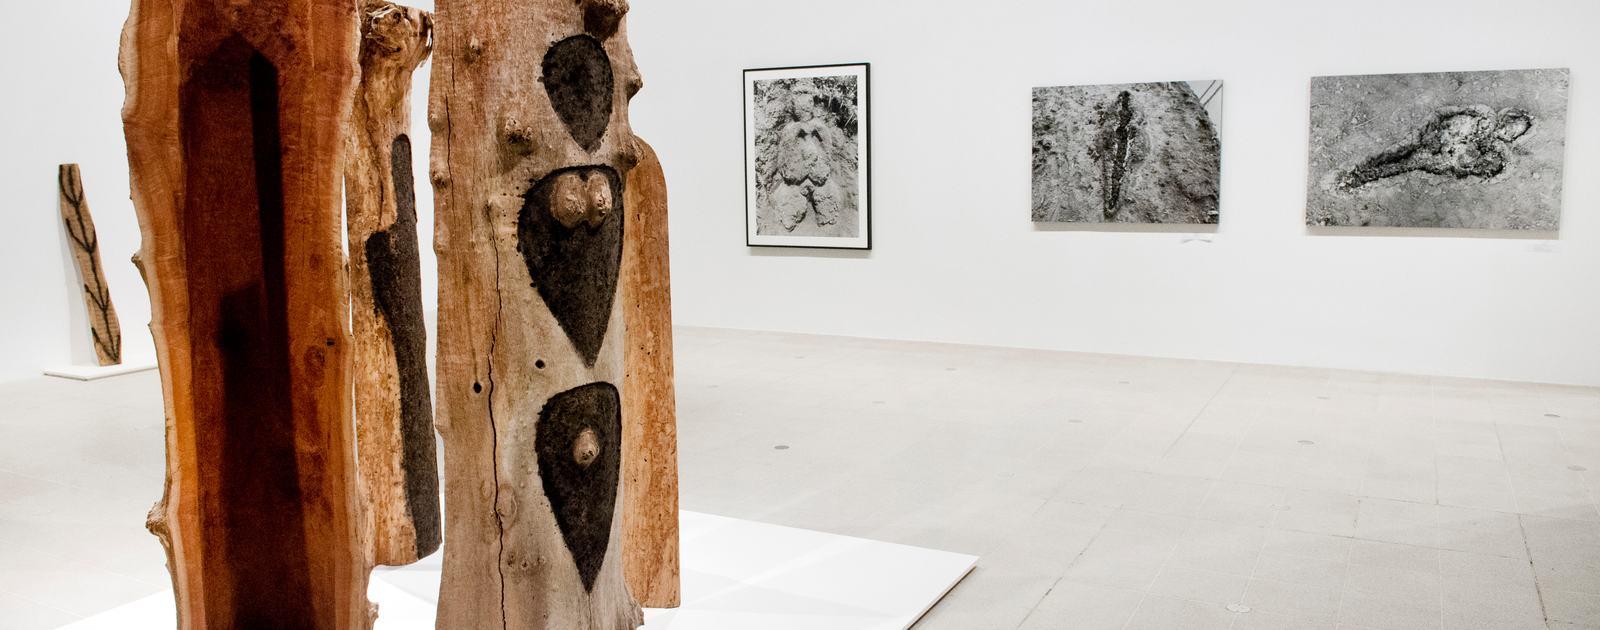 Ana Mendieta at Hayward Gallery, London. .Photo by Linda Nylind. 22/9/2013.